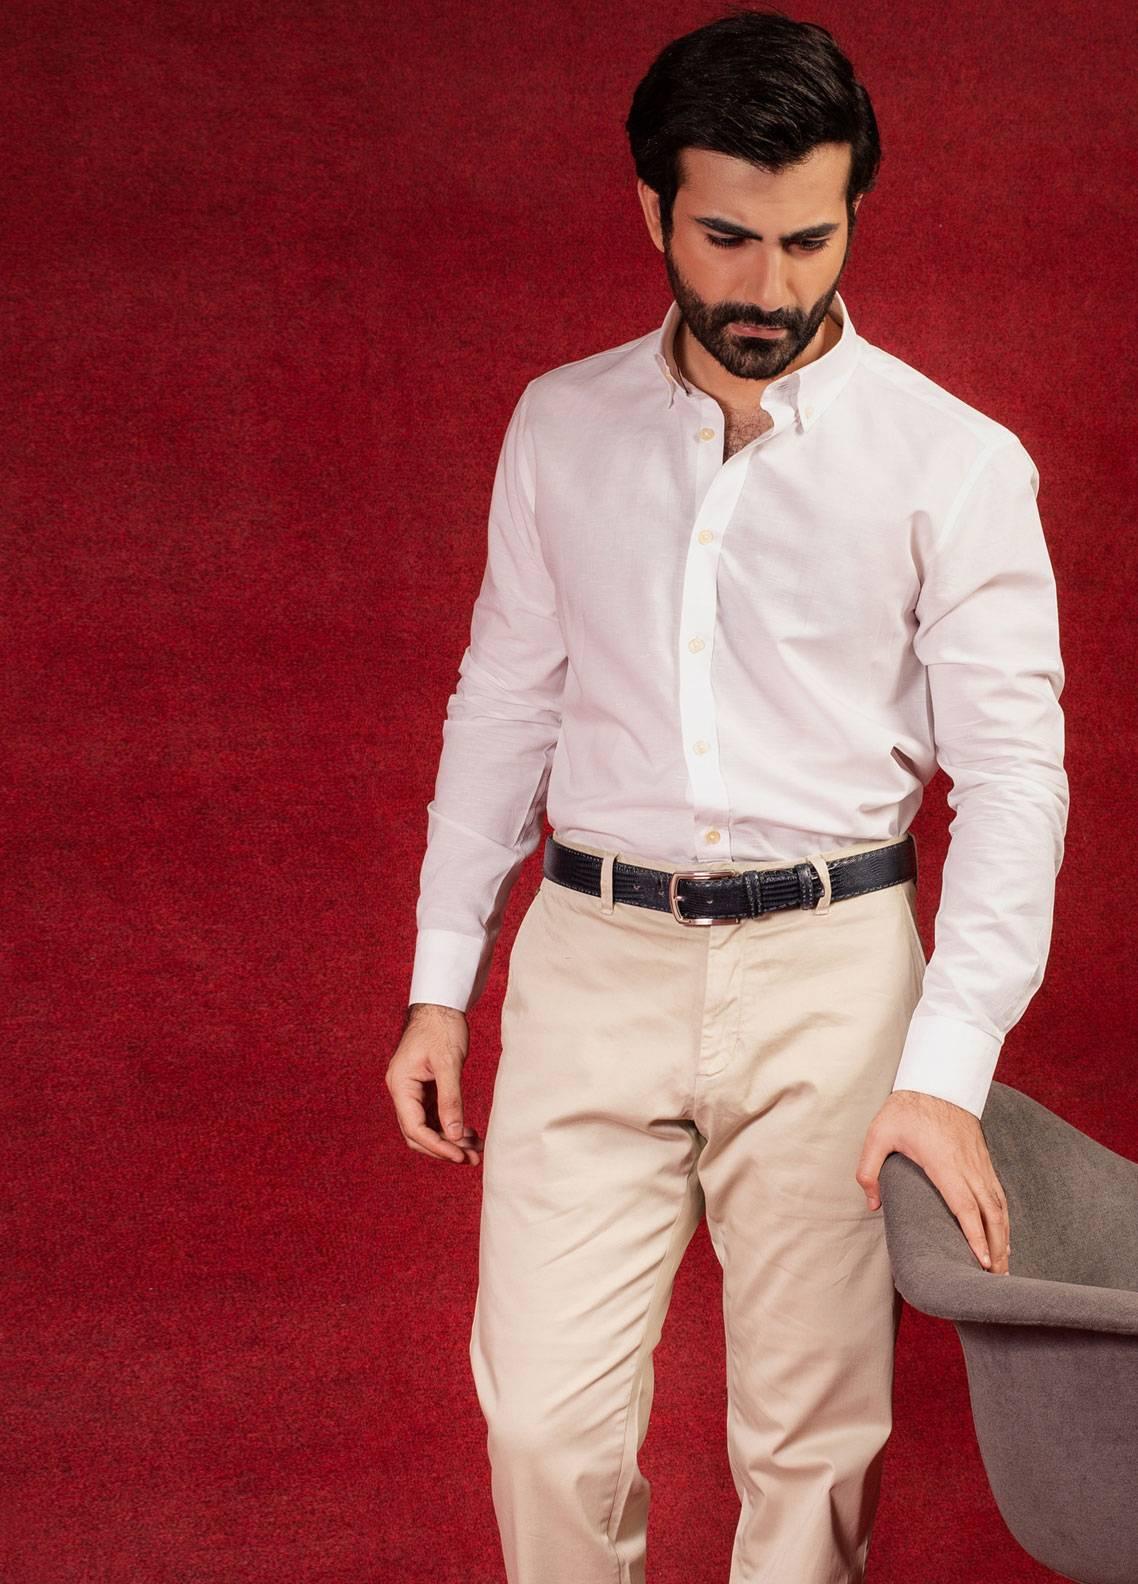 Brumano Cotton Formal Men Shirts - White BRM-640